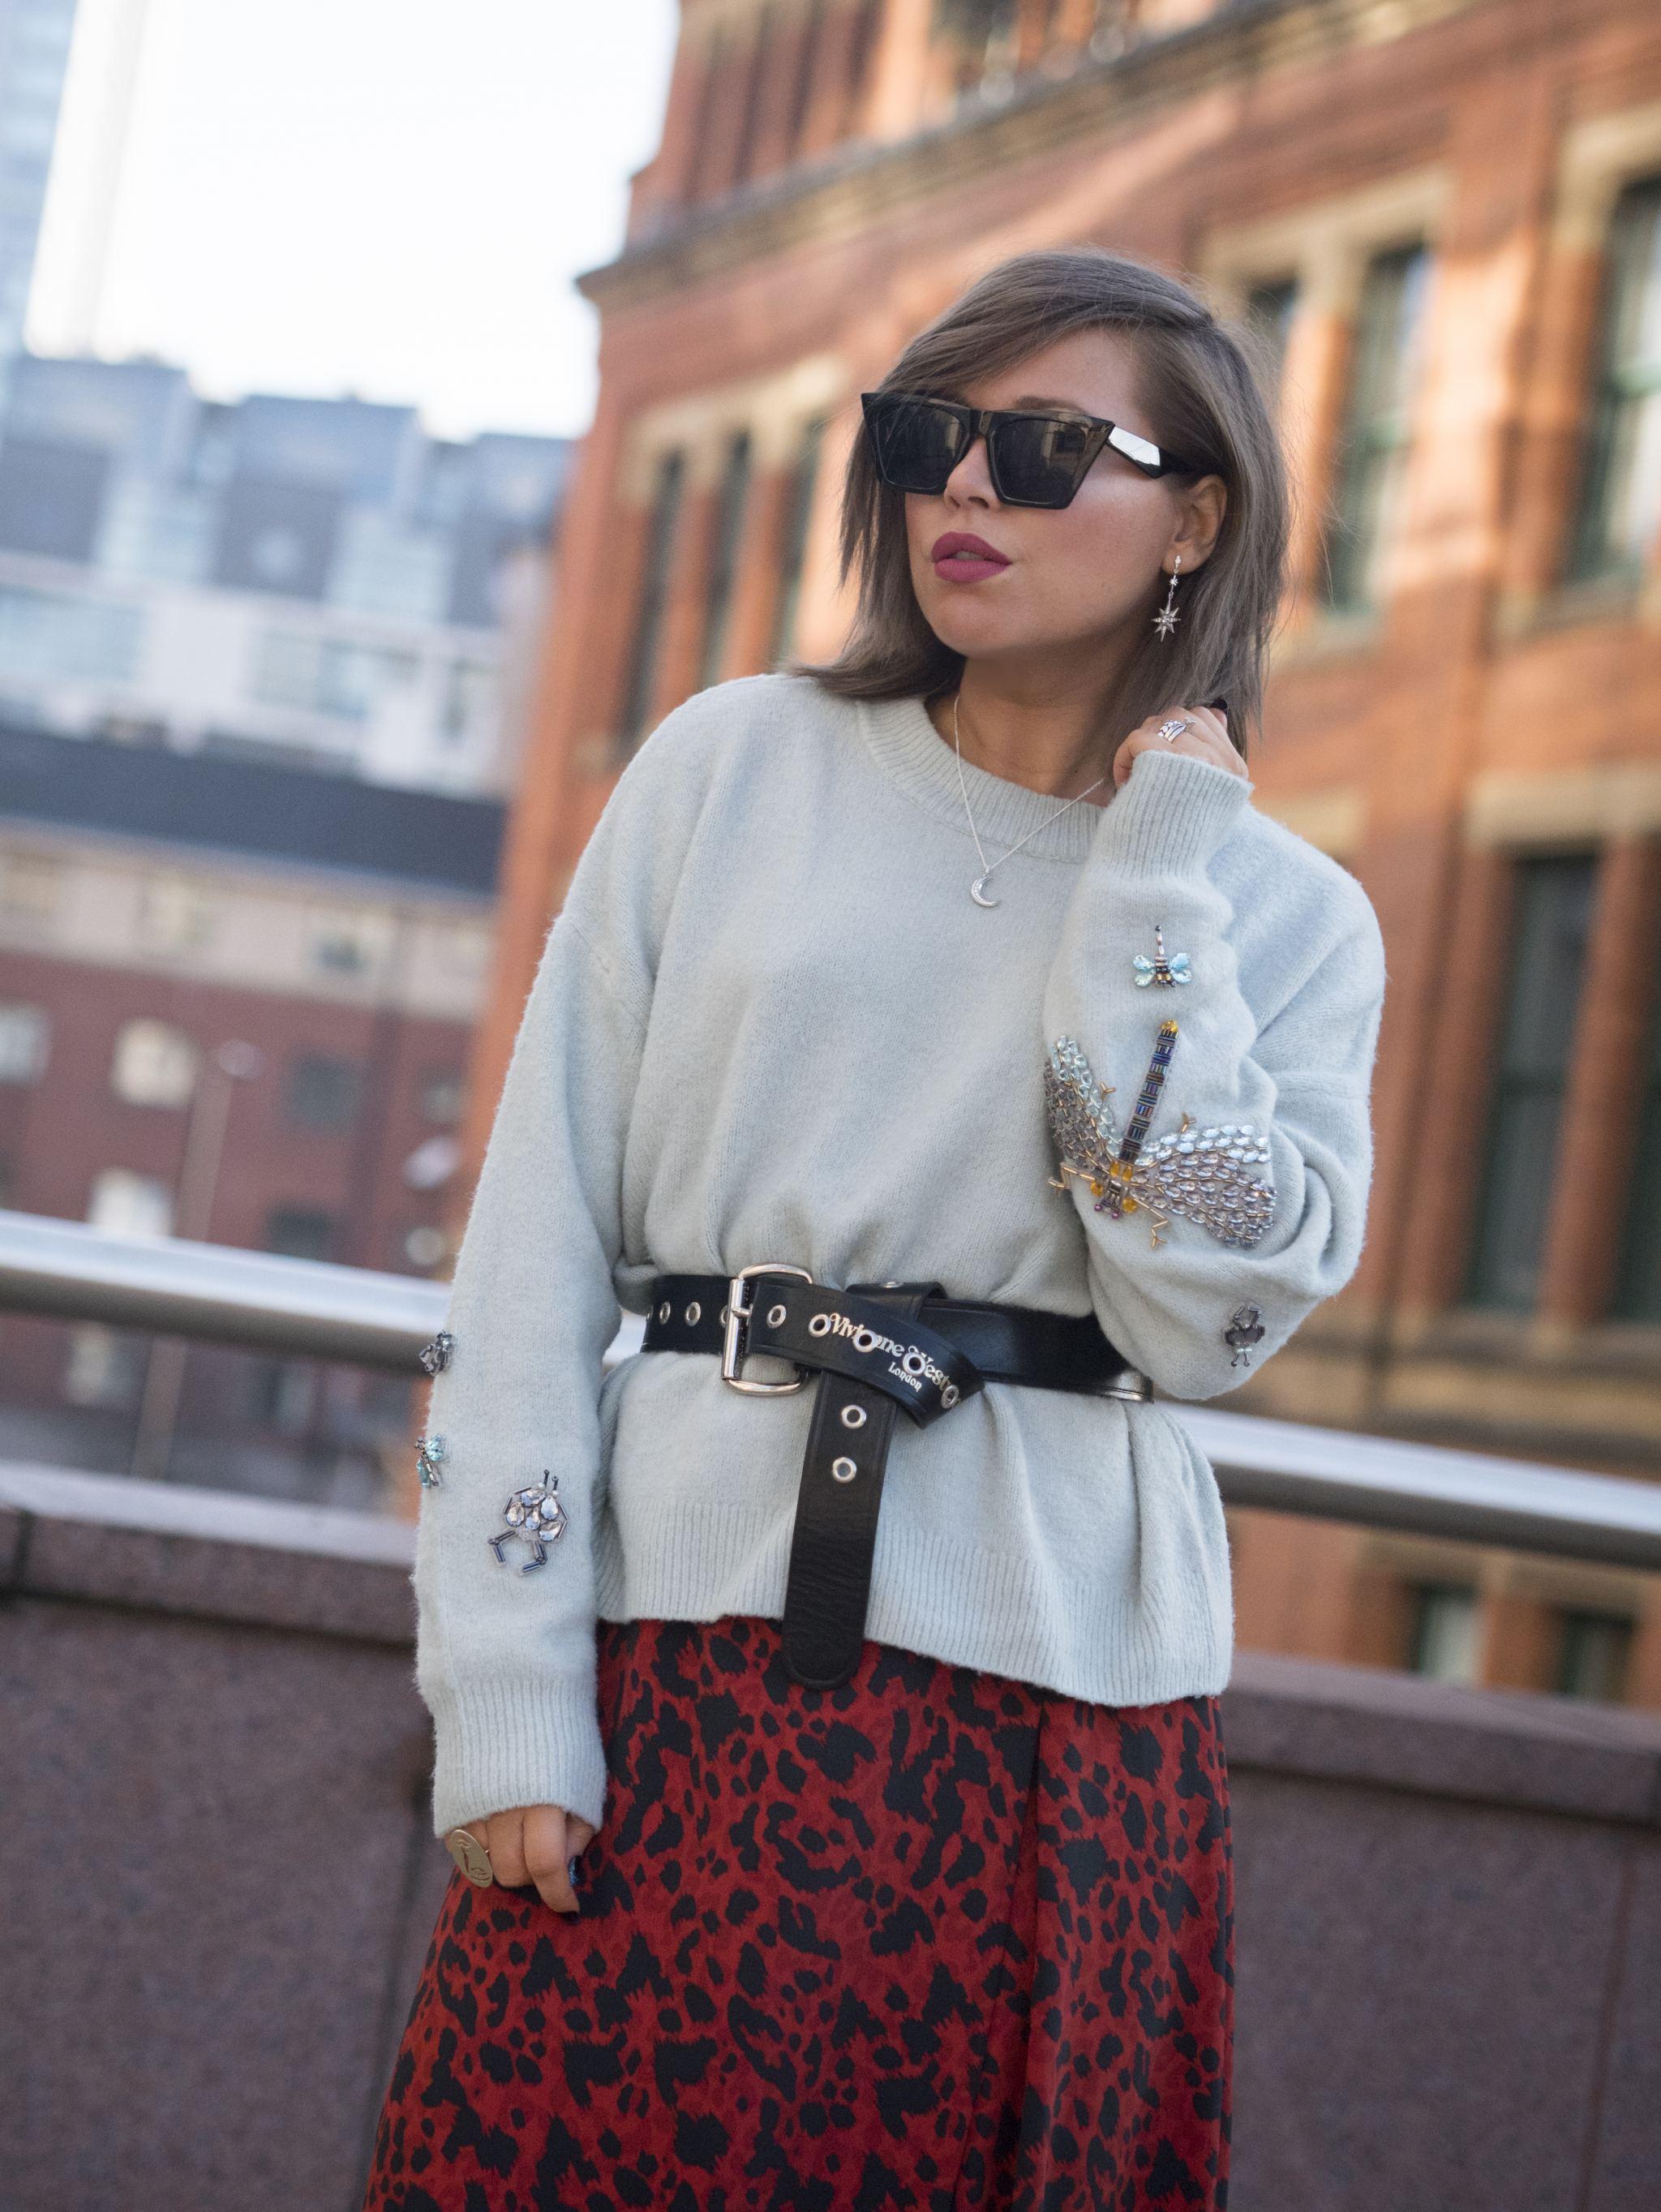 manchester fashion blogger, manchester fashion bloggers, ukblogger, thomsa sabo, thomas sabo jewellery ,Celine sunglasses, manchester bloggers, manchester fashion blogger